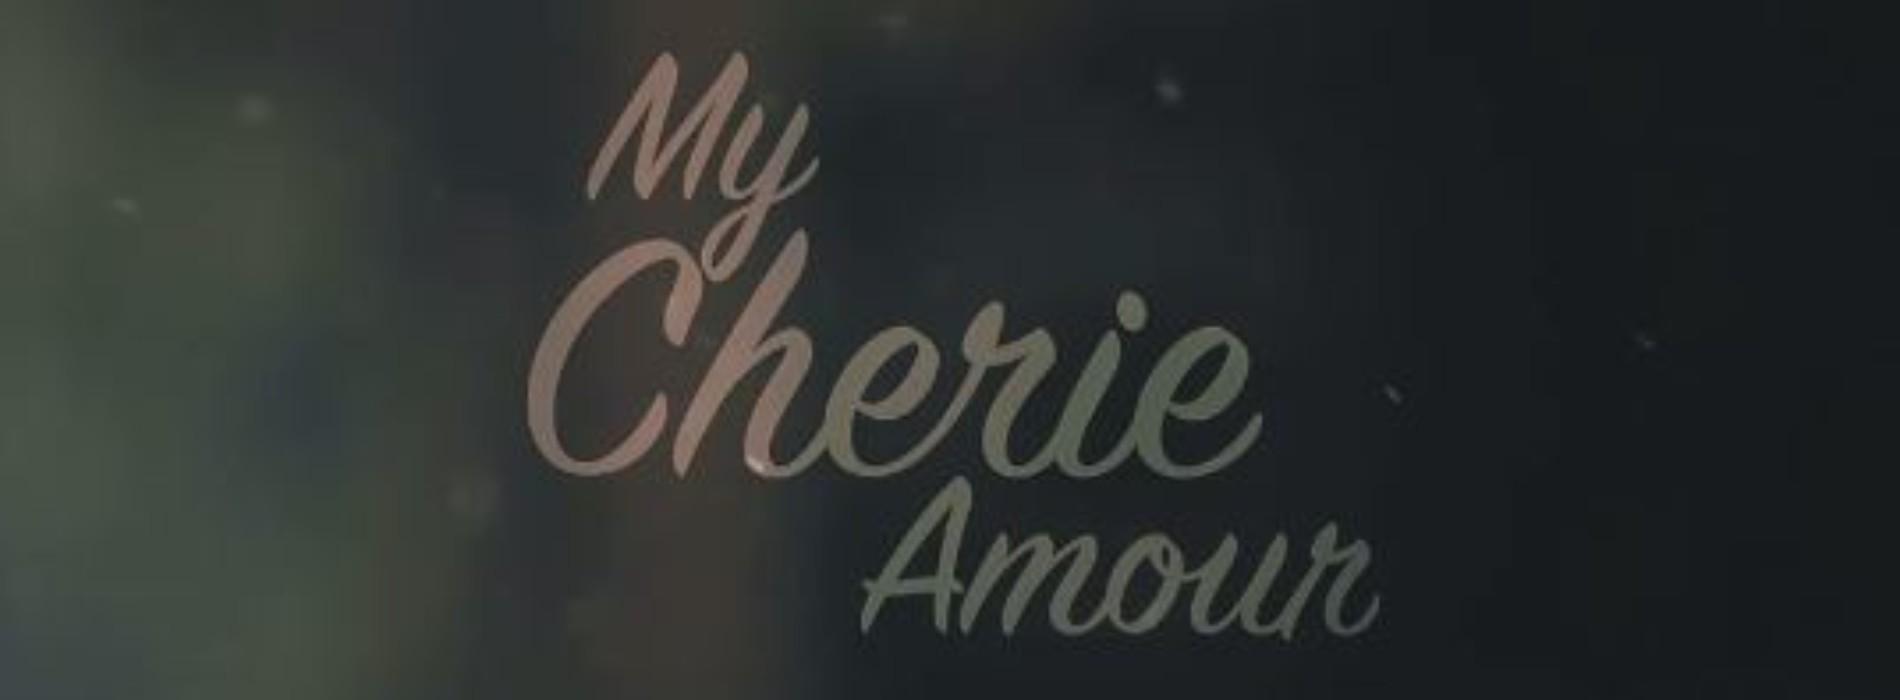 Sandun Athulathmudali Featuring Guido Mancino – My Cherie Amour